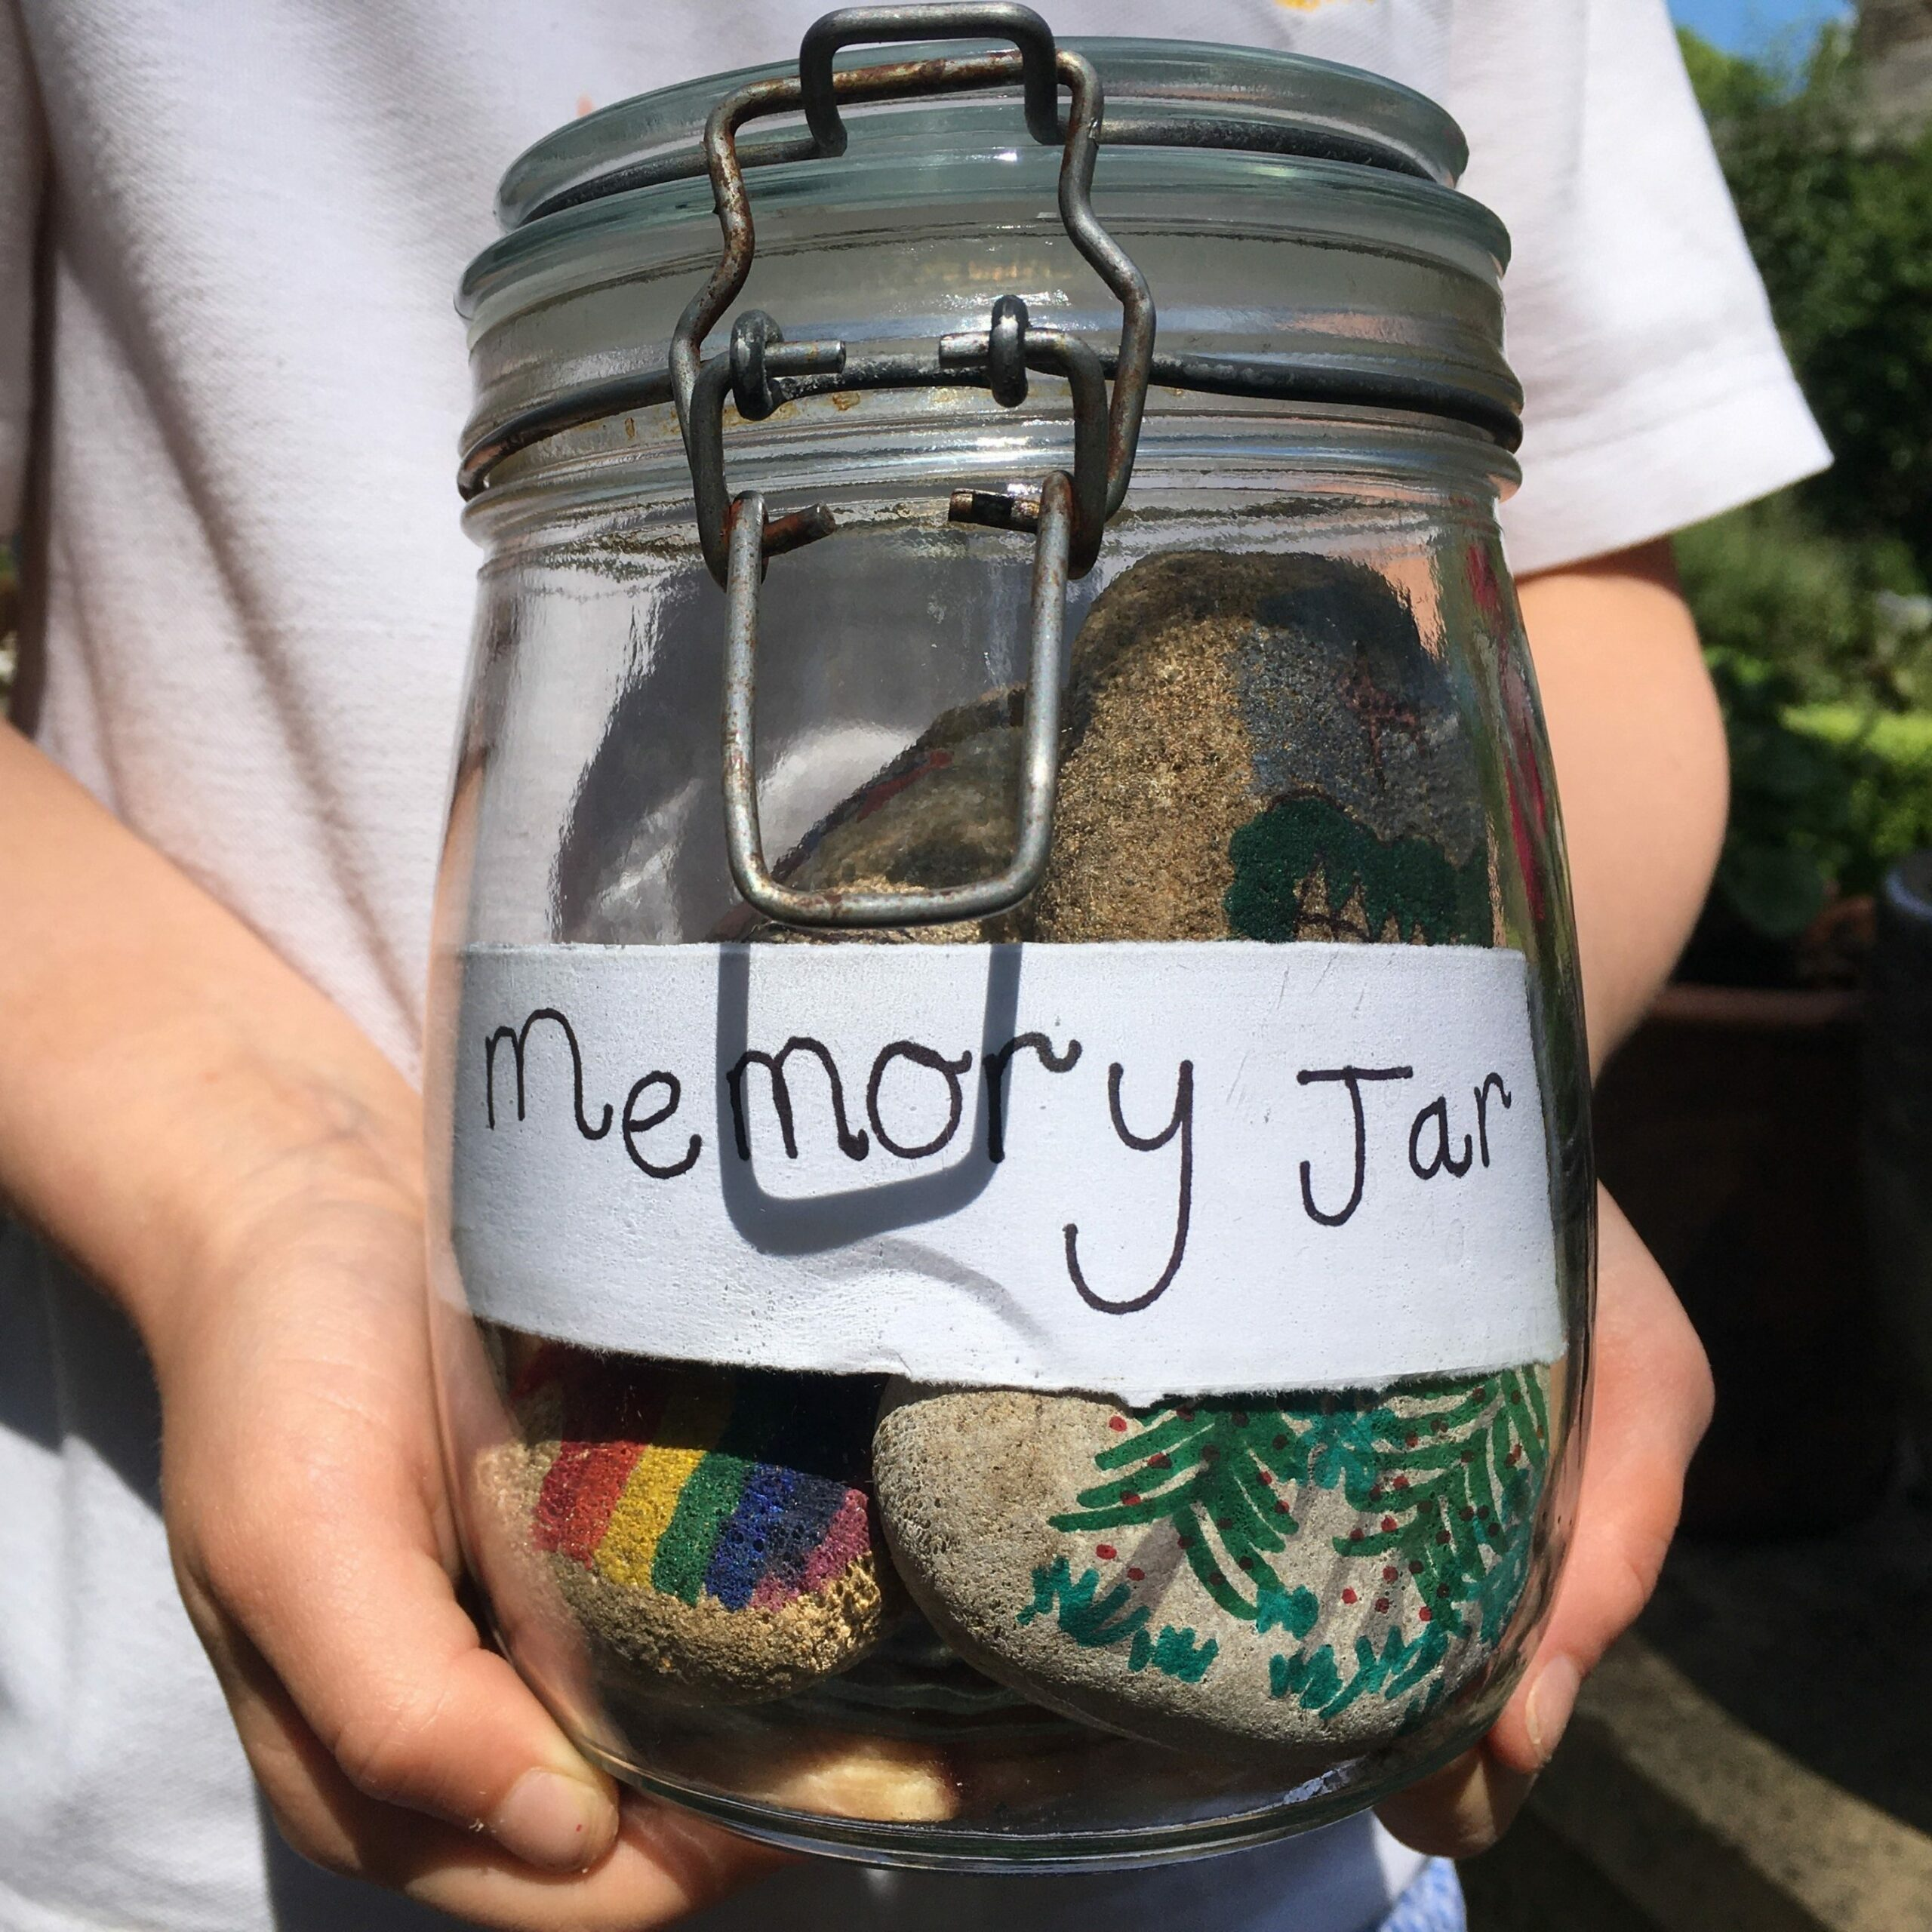 Memory jar with rocks in